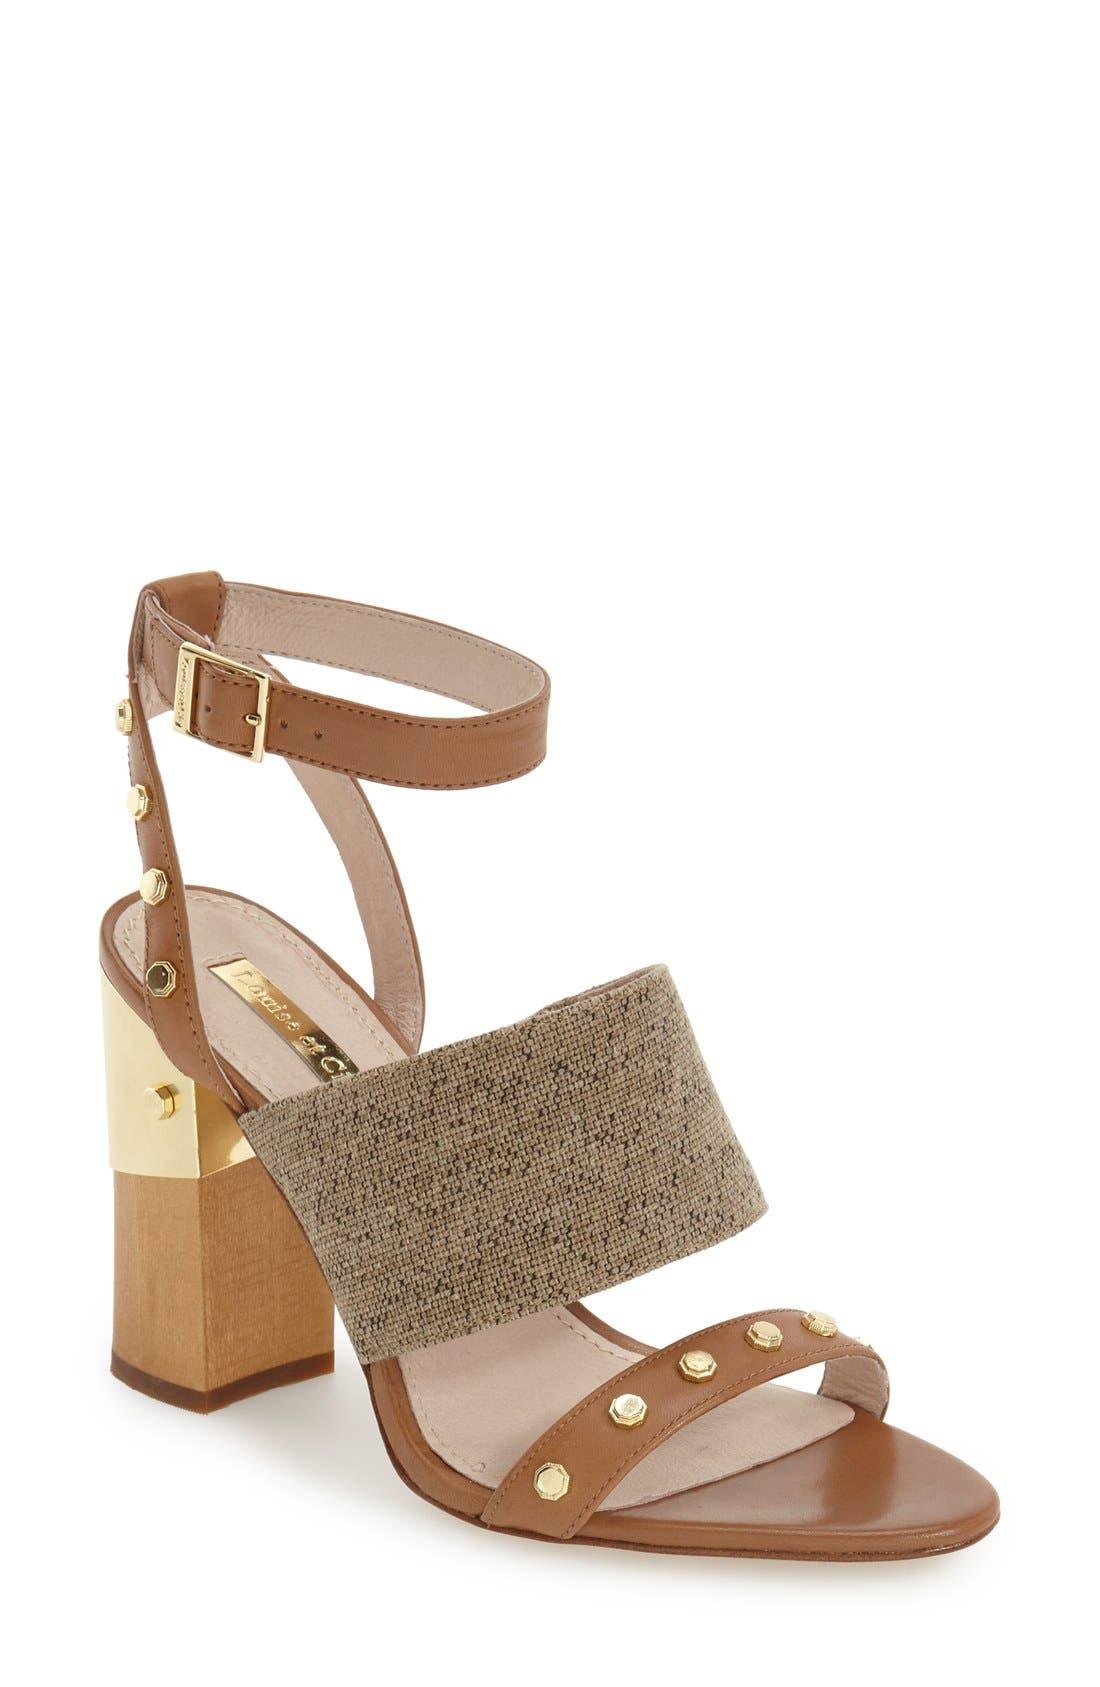 Main Image - Louise et Cie 'Kellyn' Studded Sandal (Women)